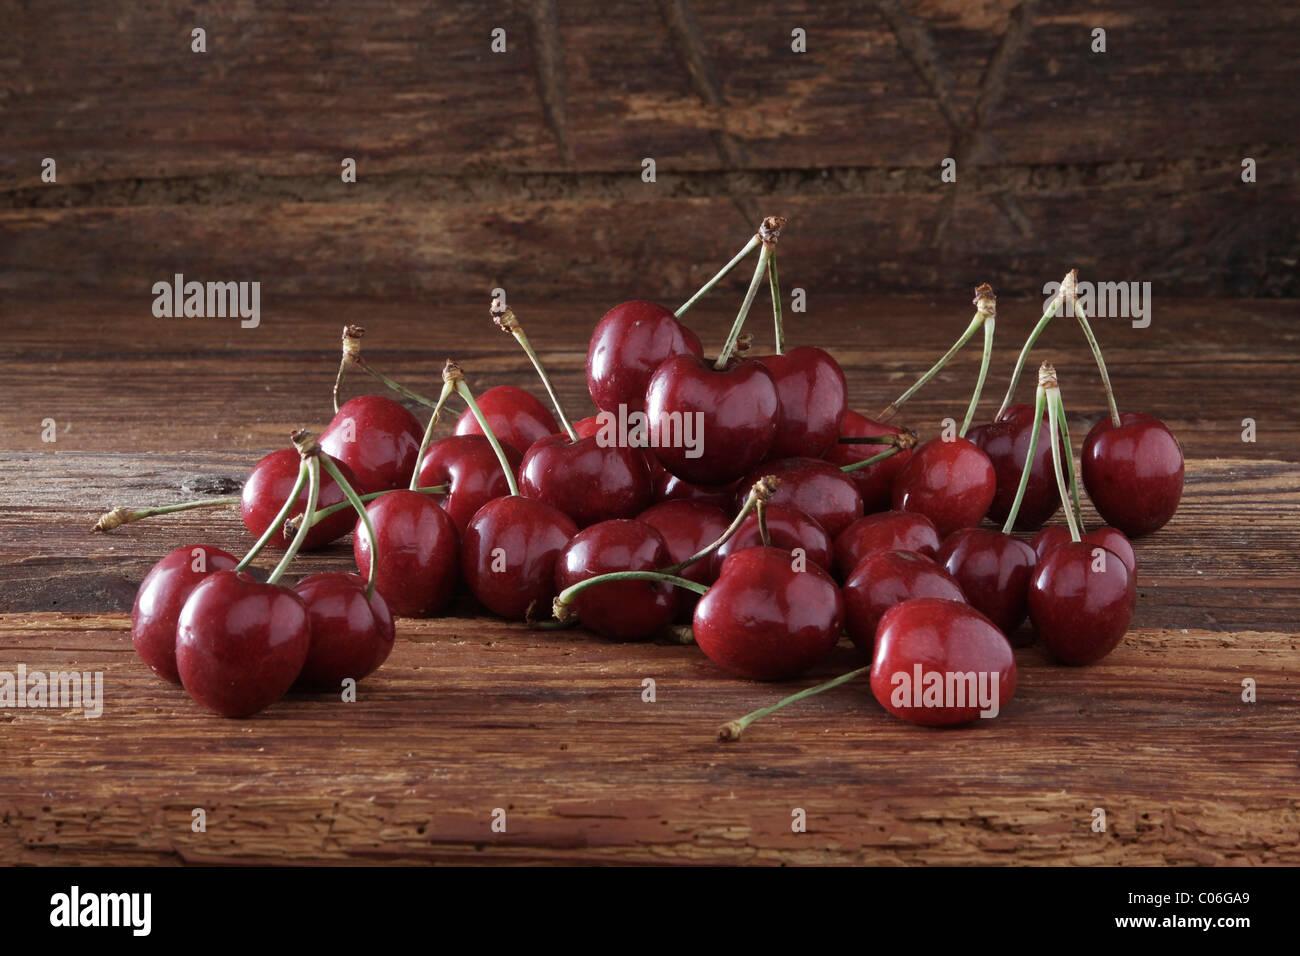 Cherries on rustic wood - Stock Image